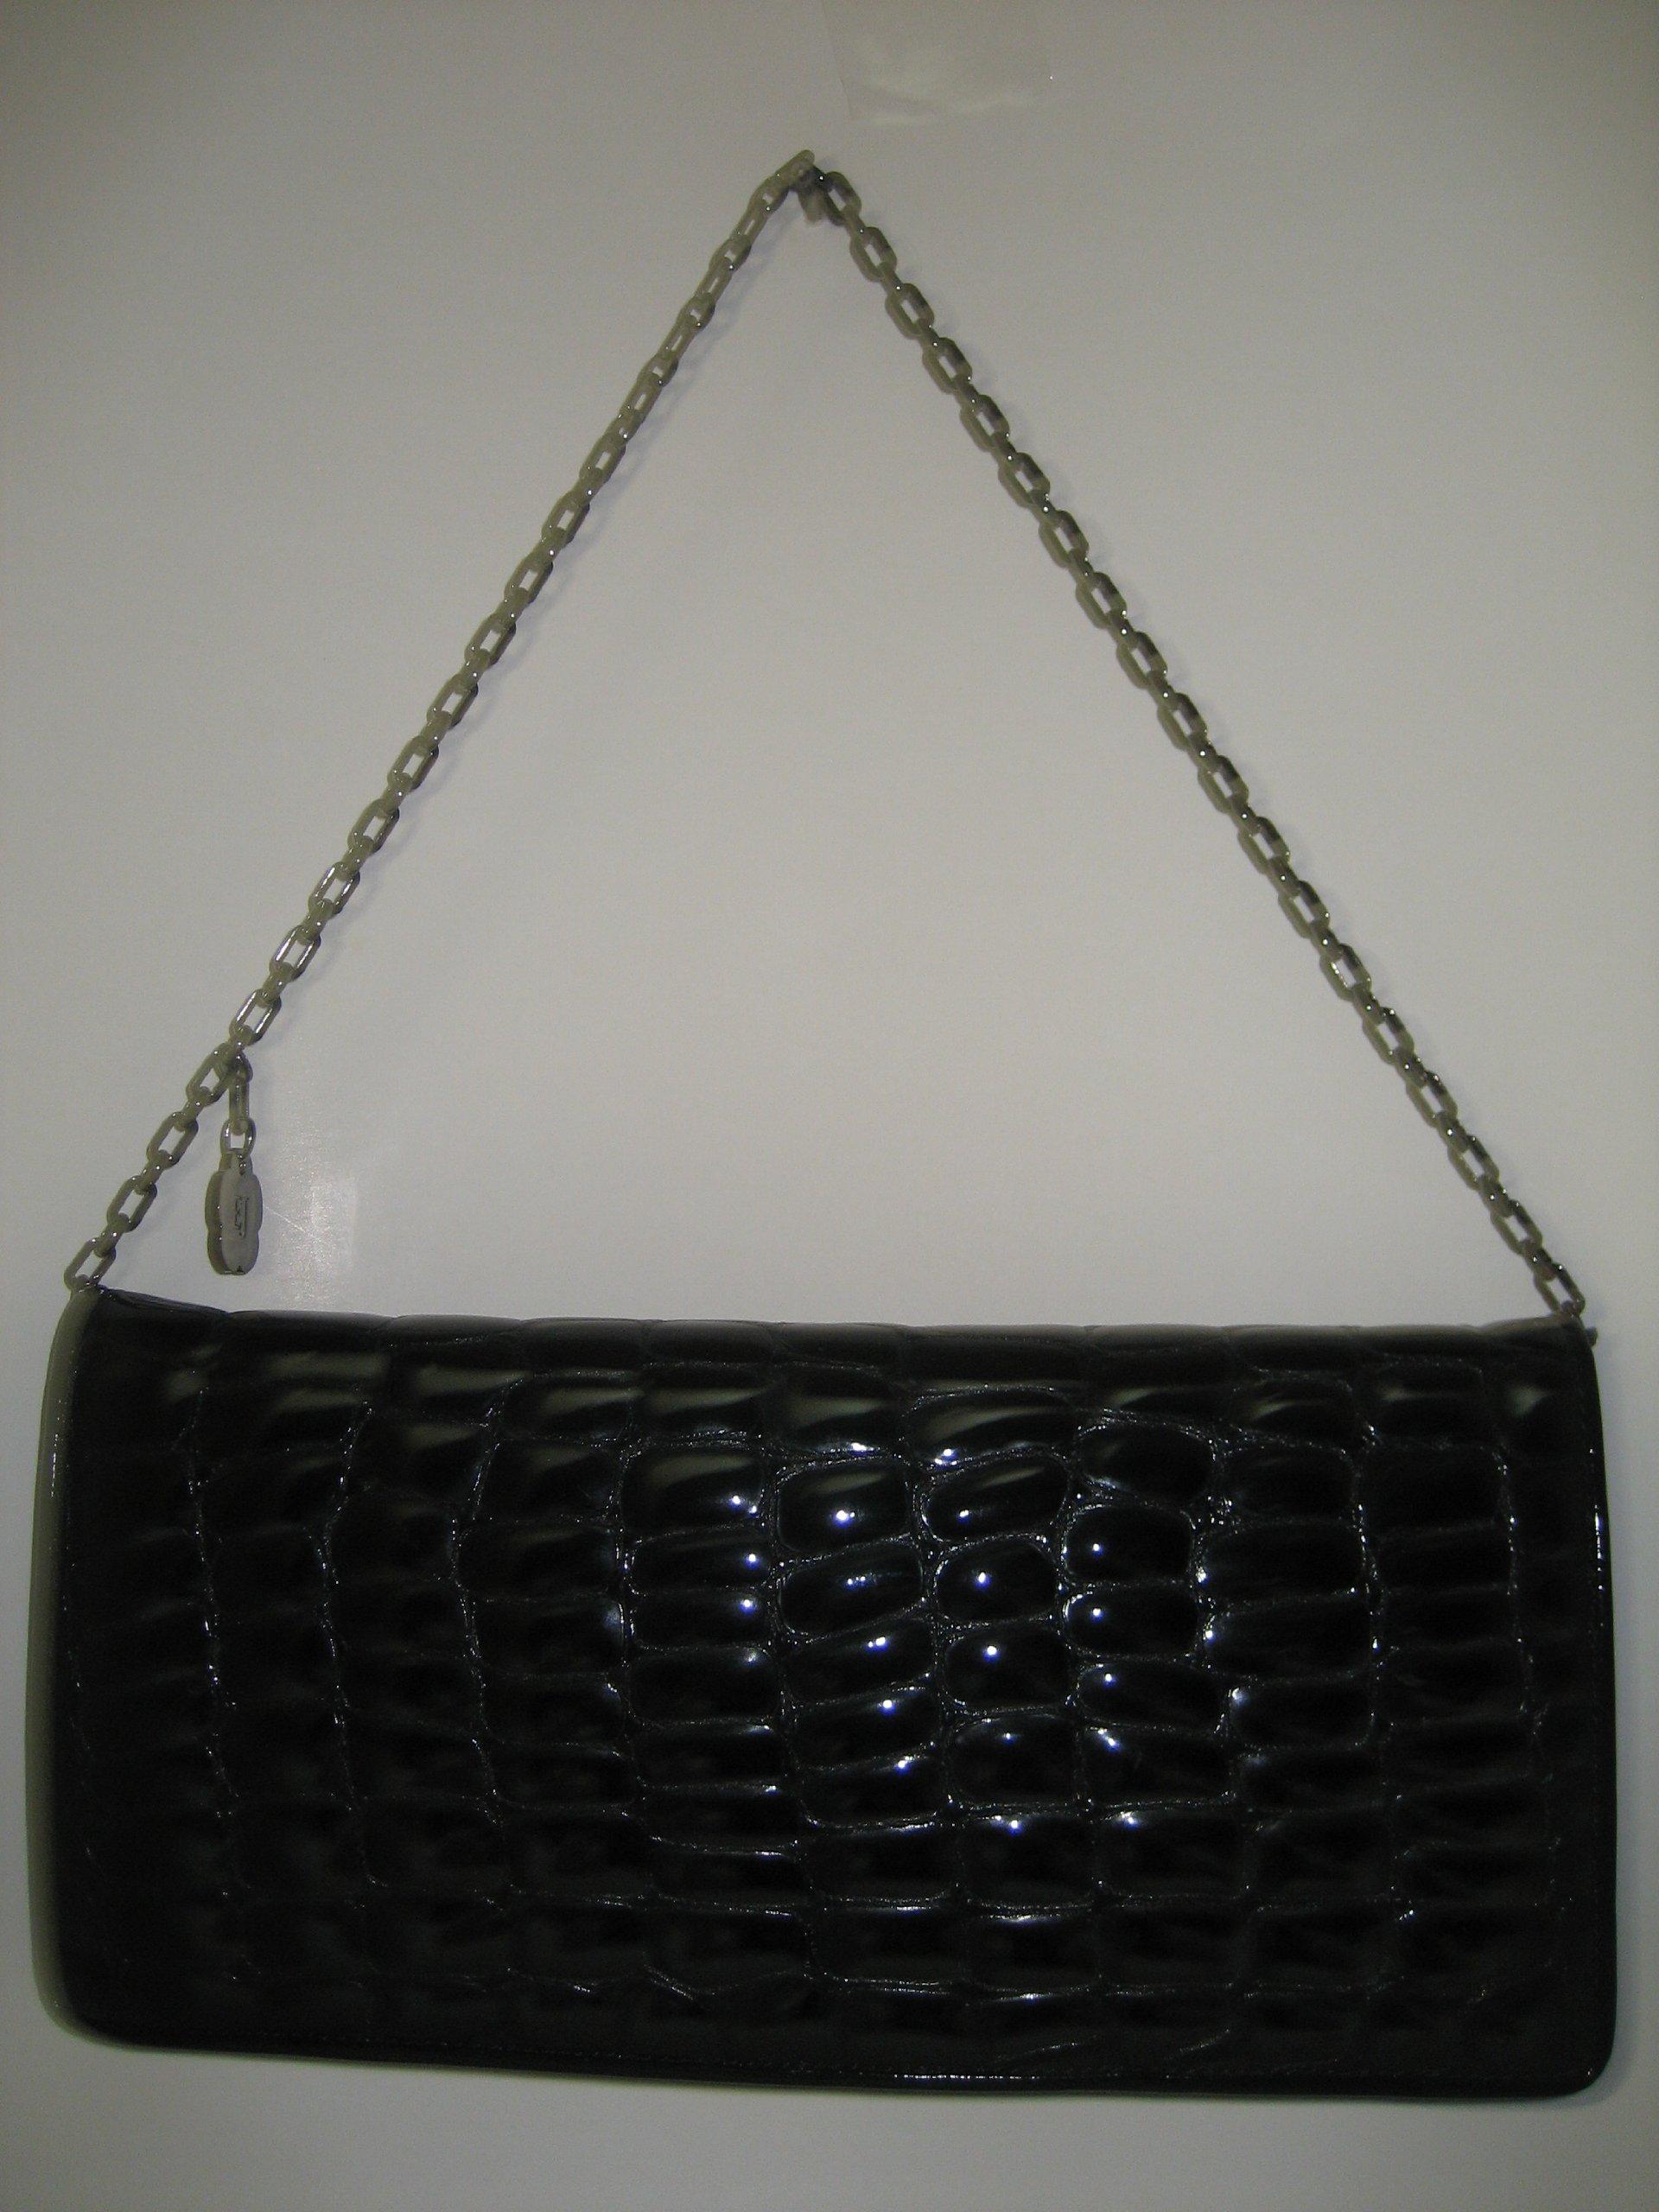 Eric Javits Luxury Fashion Designer Women's Handbag - Baentley - Liquid